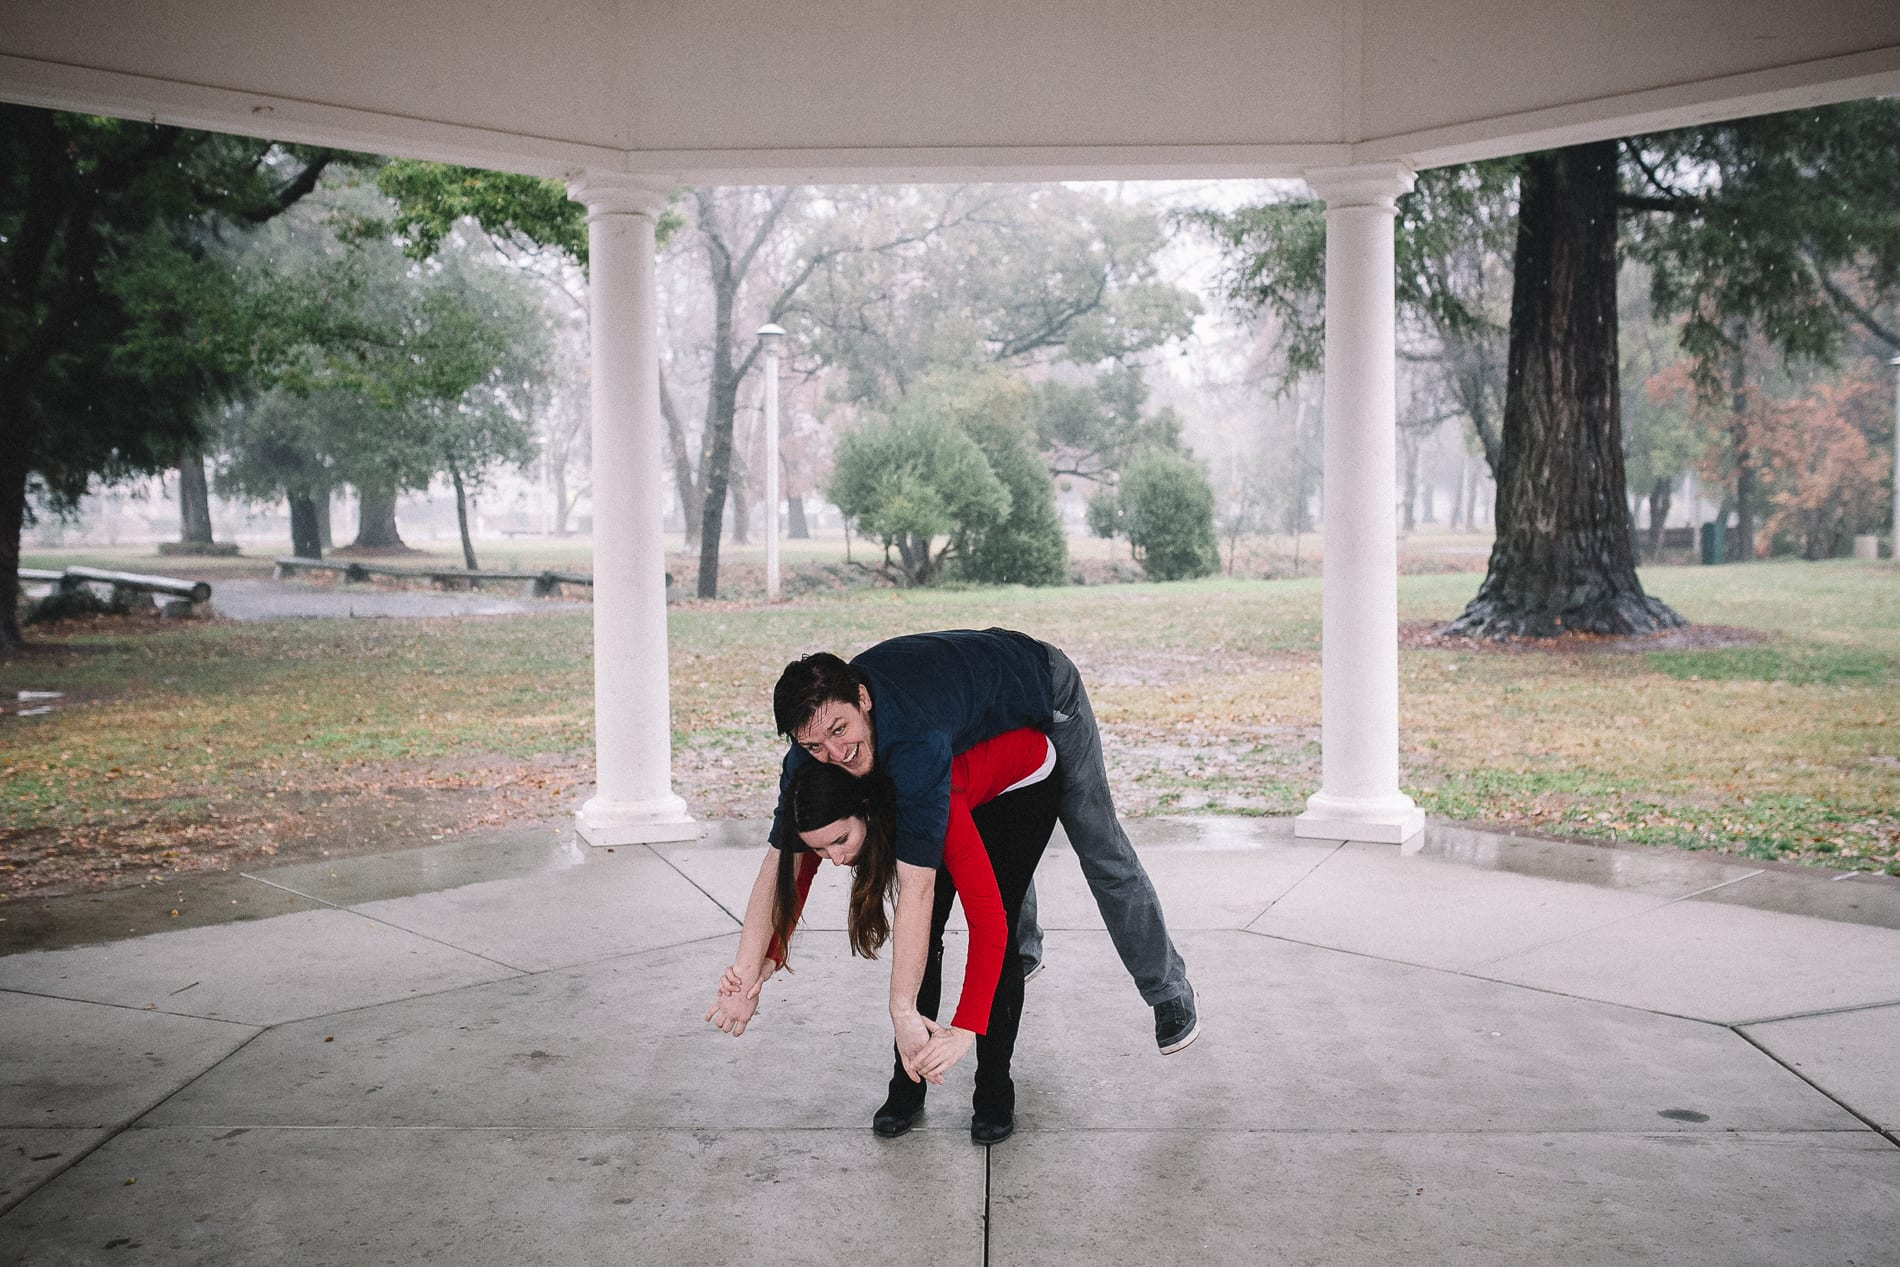 redding-caldwell-lake-park-gazebo-couples-photo-5